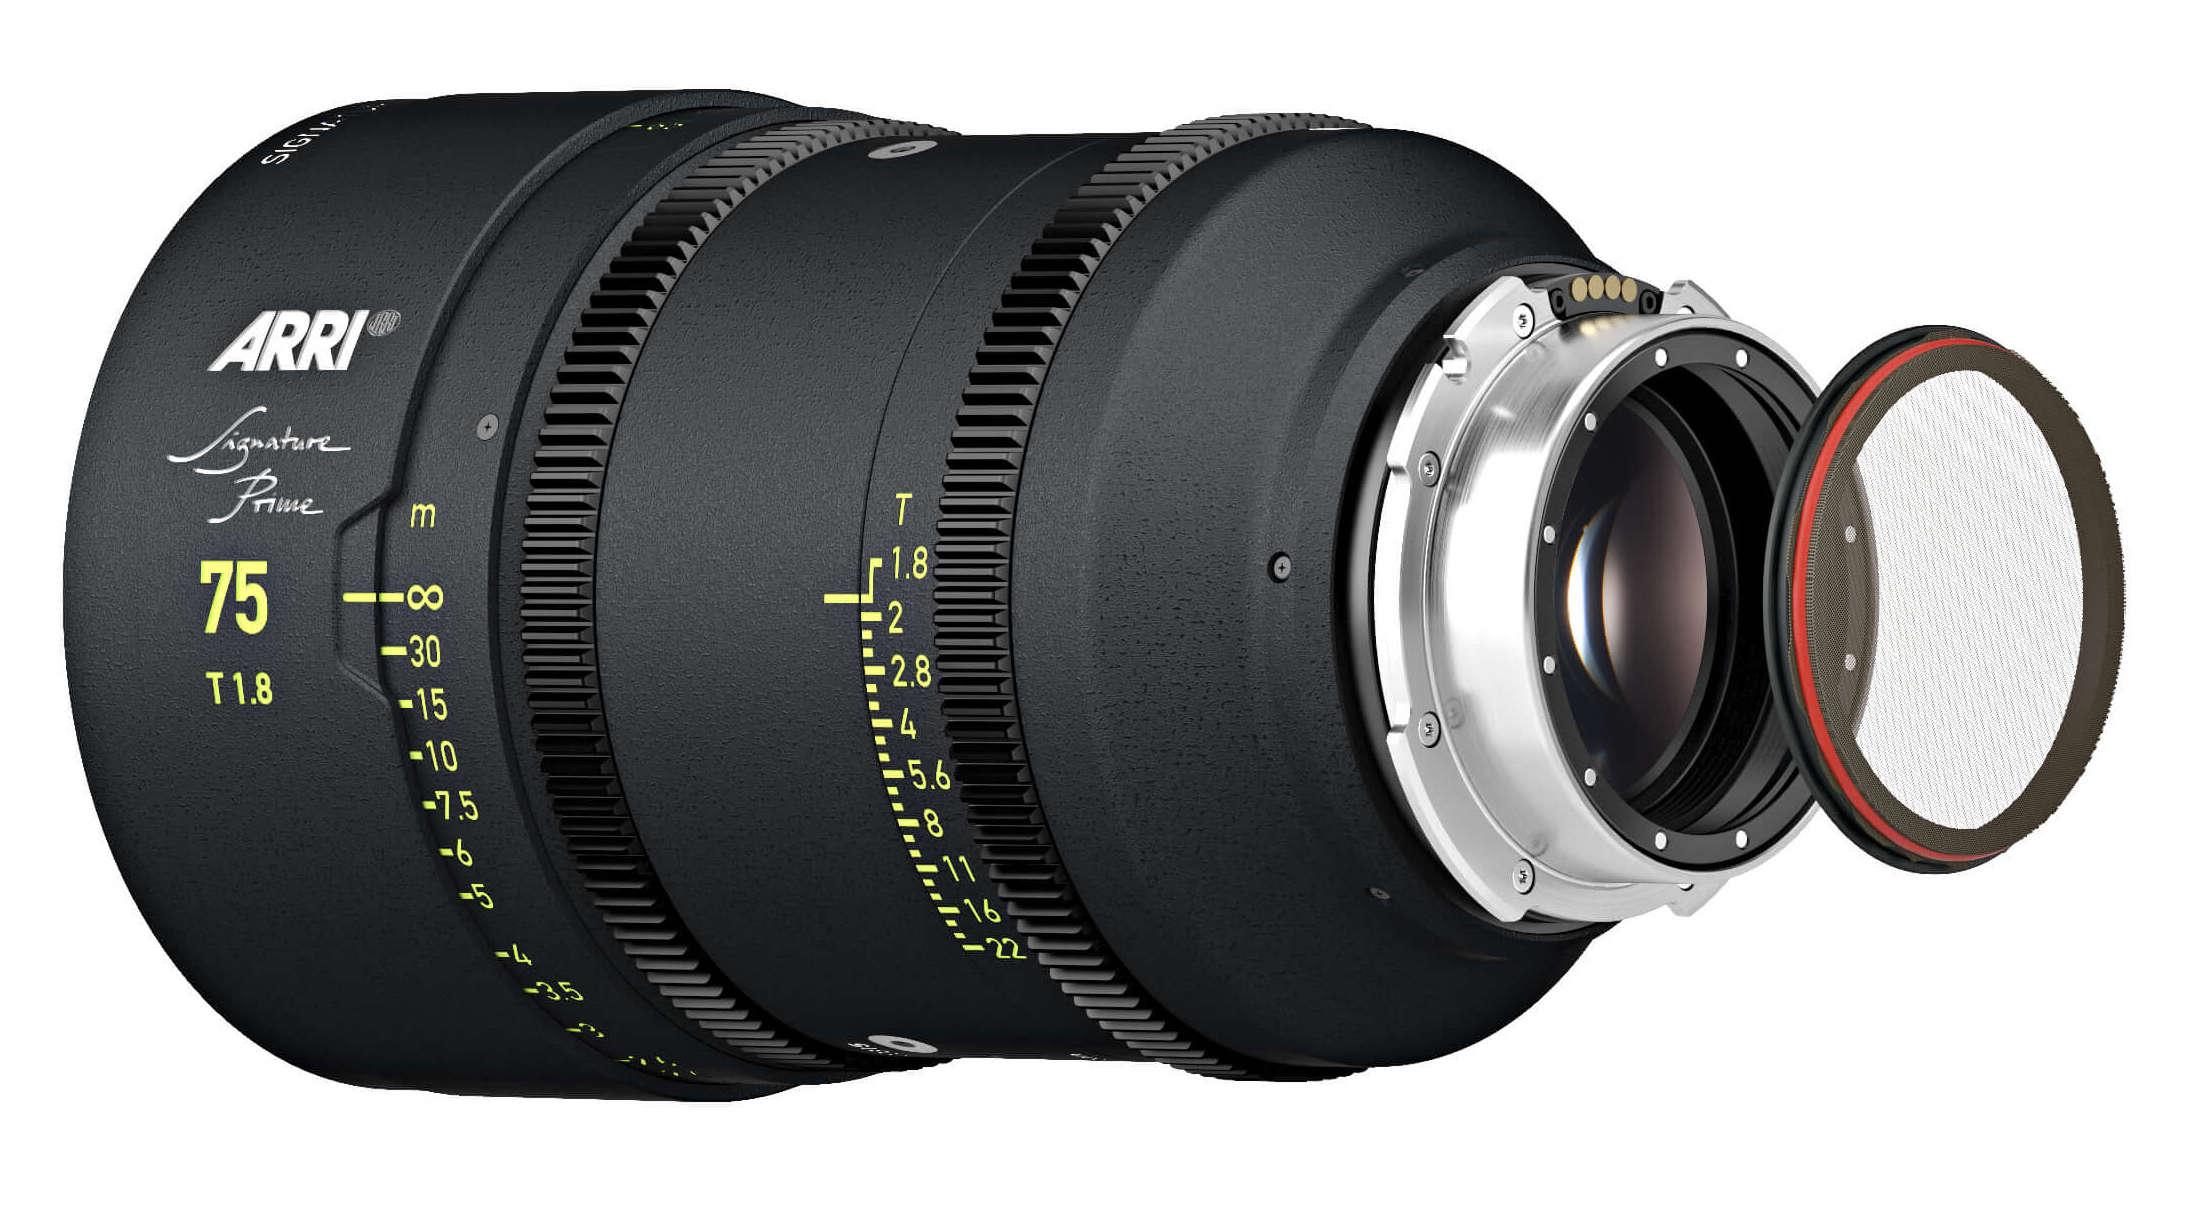 Arri Signature Prime lens 75mm net holder